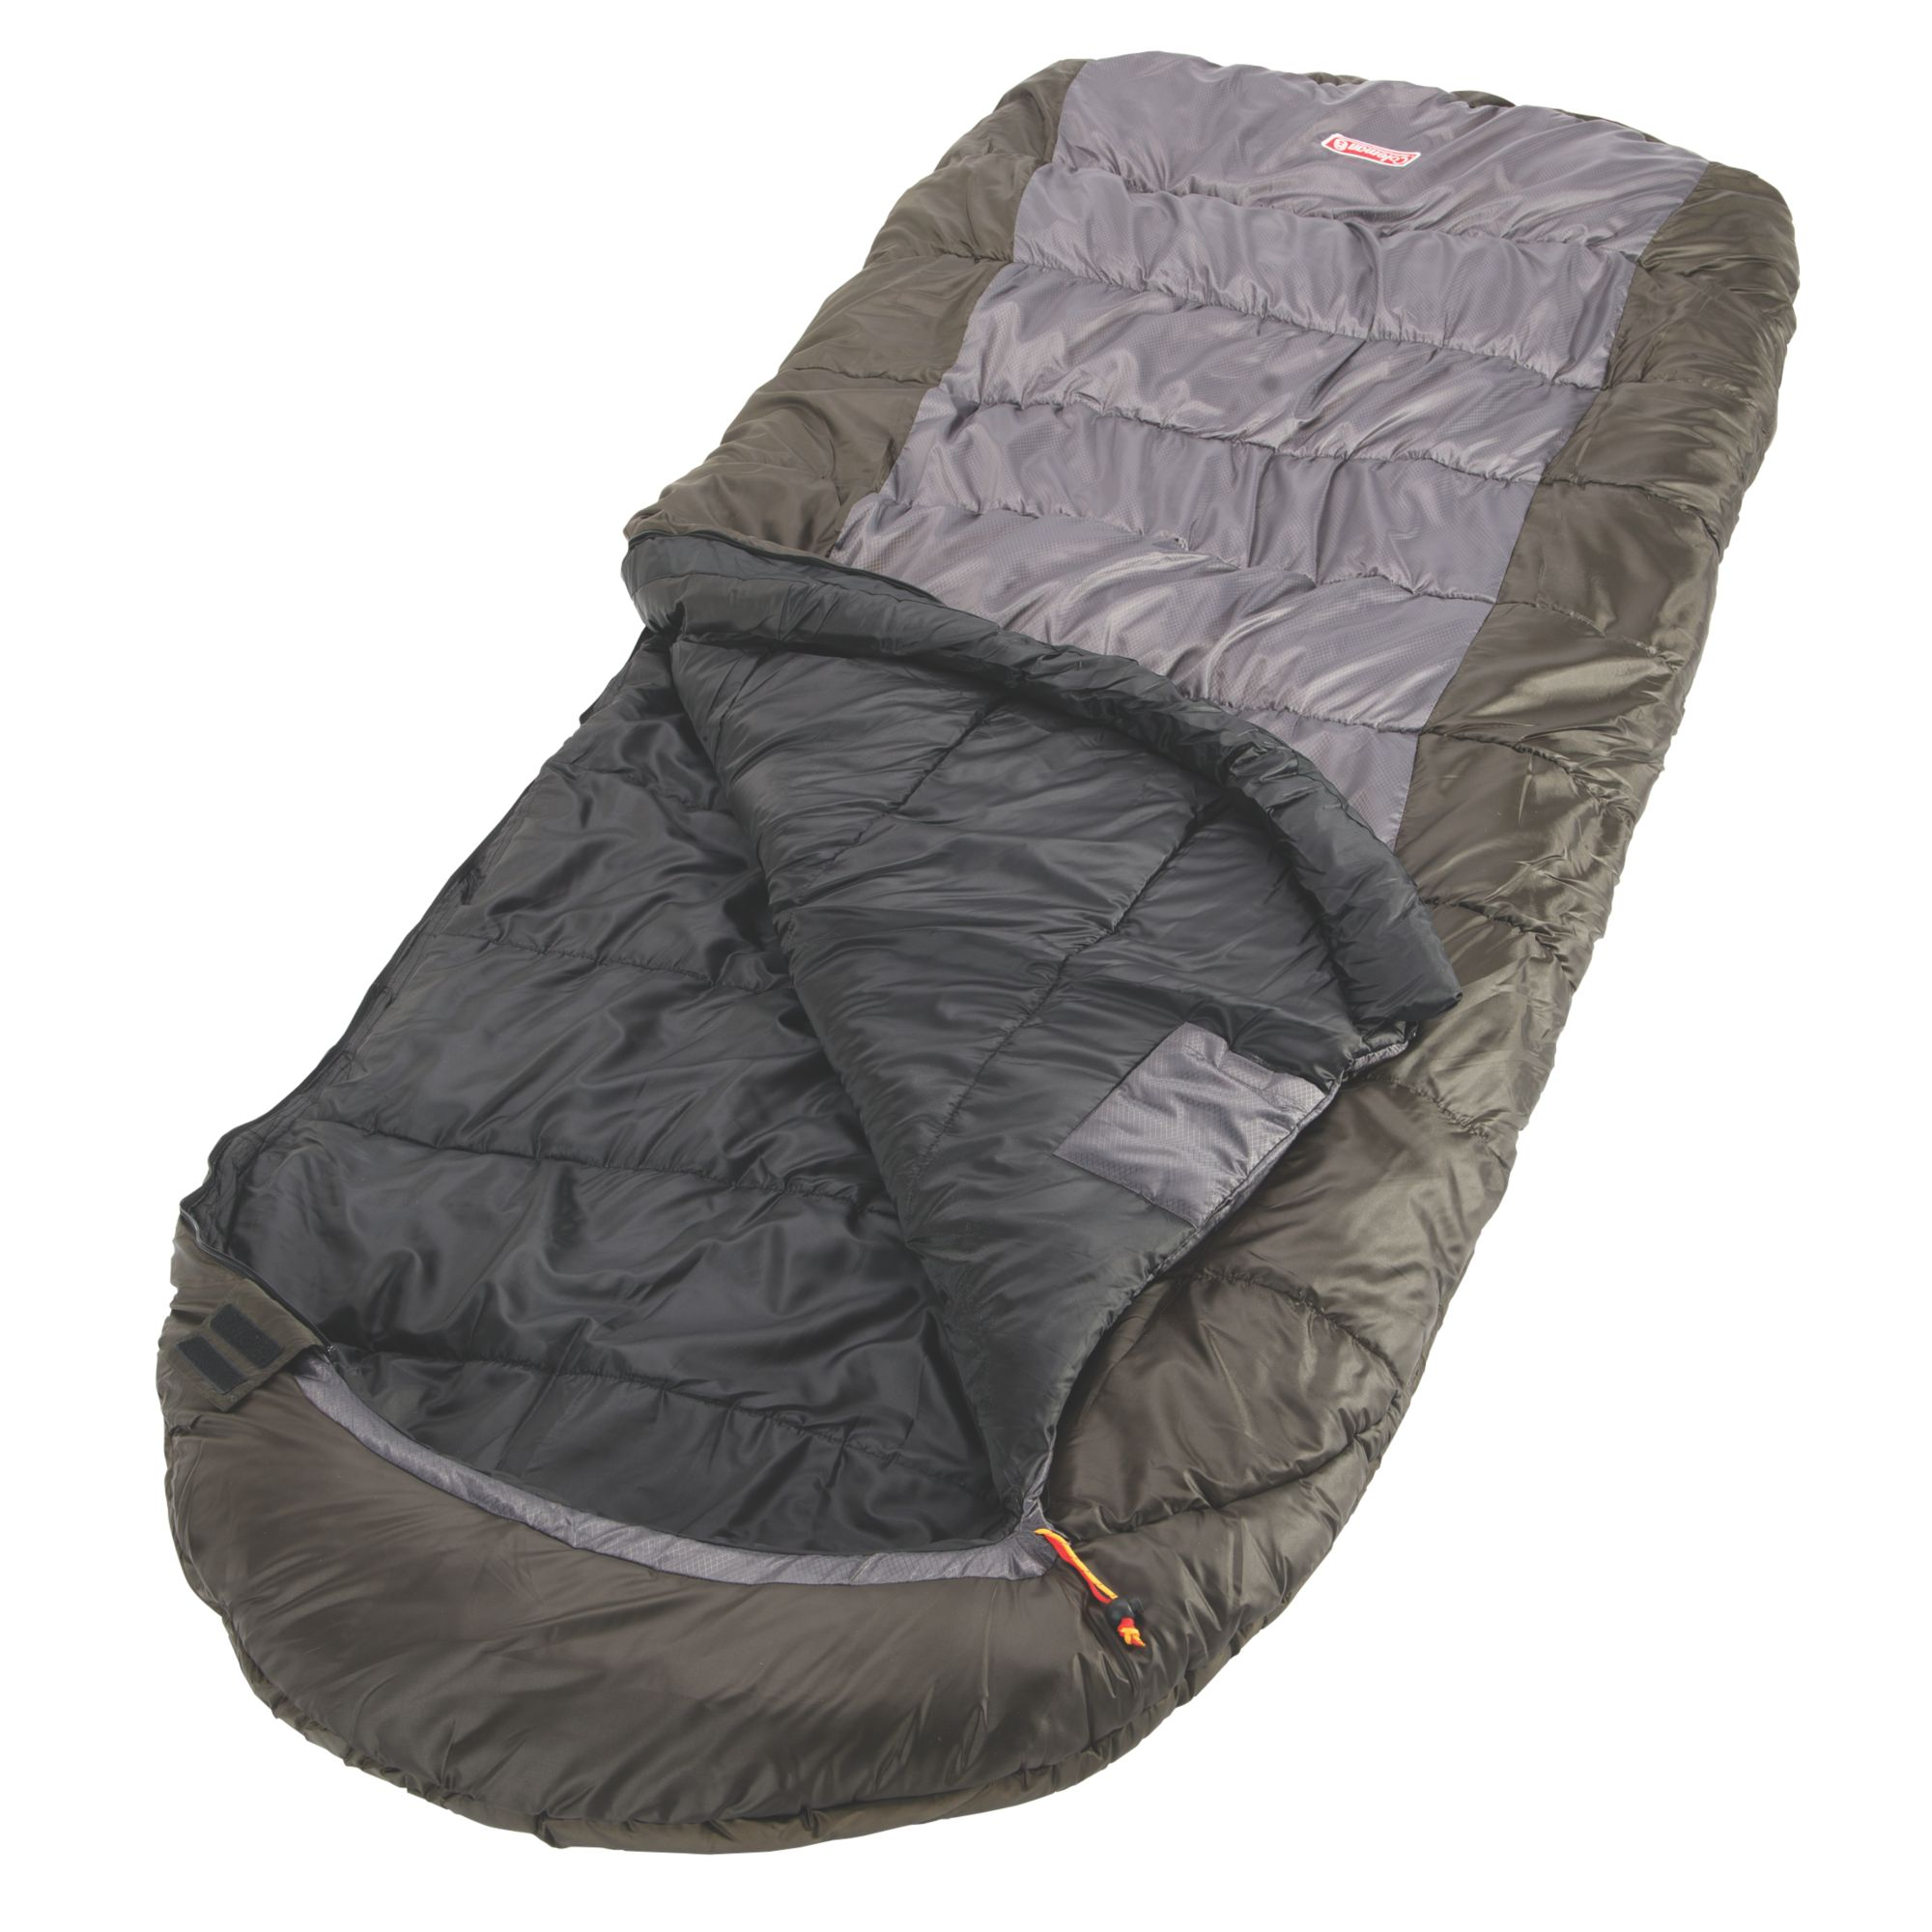 Big BasinTM 15 Tall Sleeping Bag